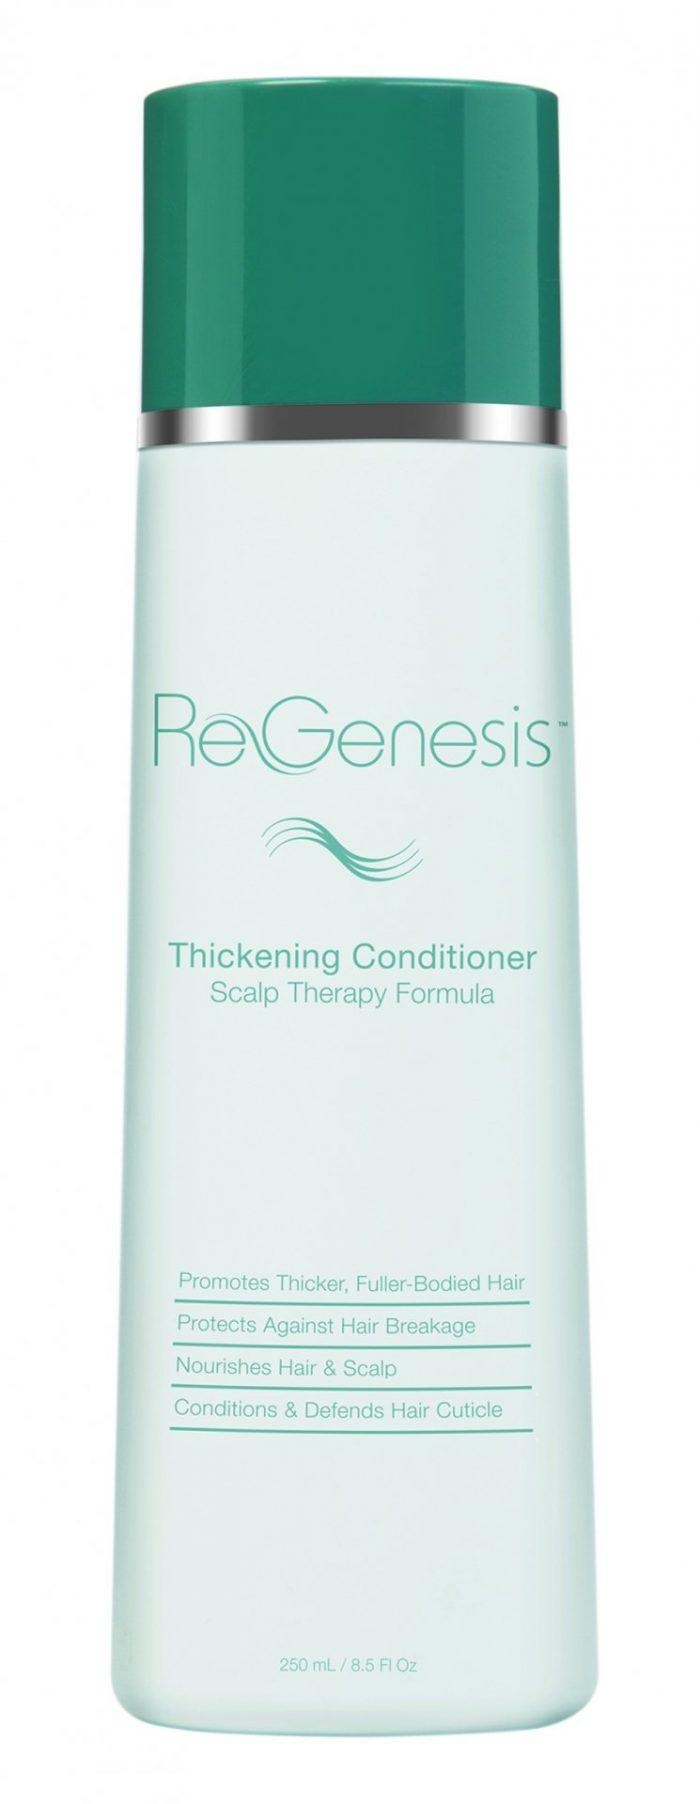 ReGenesis - Thickening Conditioner- Scalp Therapy Formula 250ml